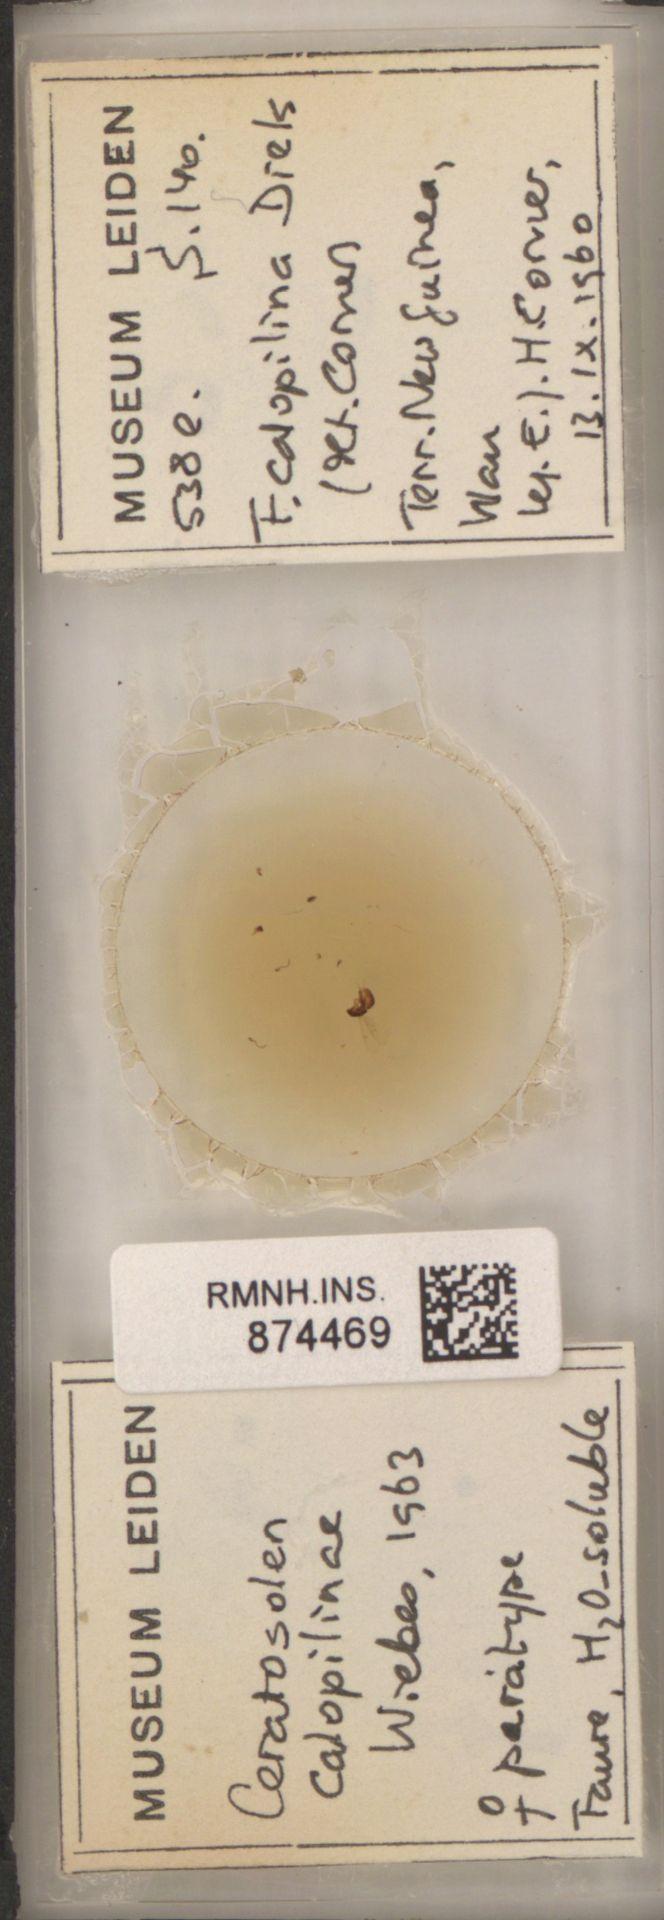 RMNH.INS.874469 | Ceratosolen calopilinae Wiebes, 1963